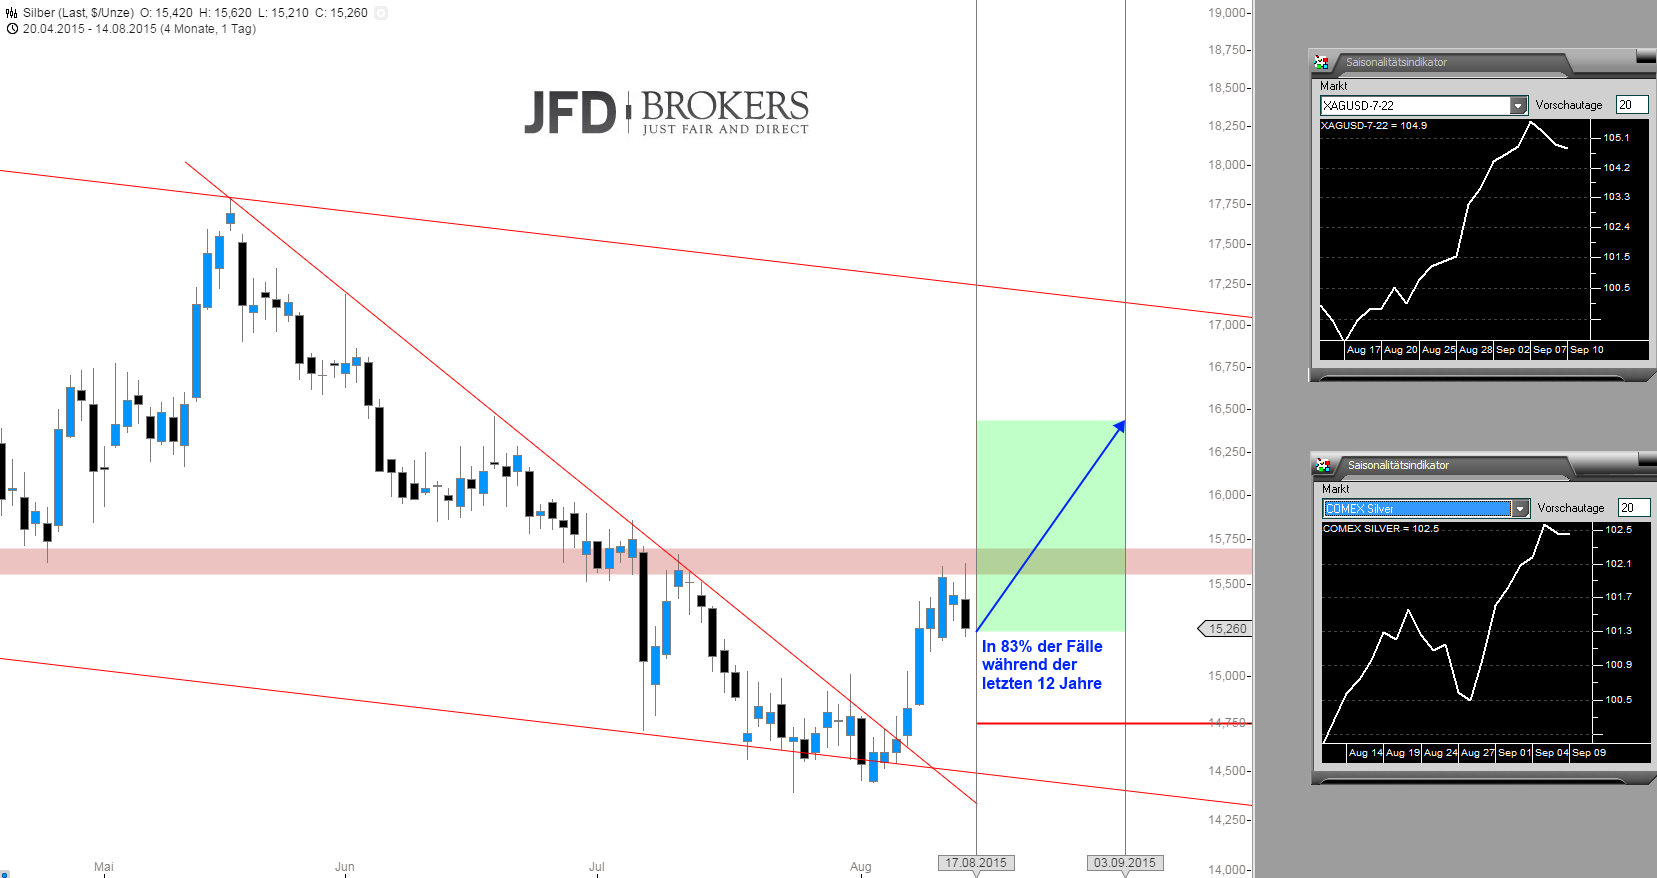 Es-wird-saisonal-bullischer-bei-Gold-und-Silber-Kommentar-JFD-Brokers-GodmodeTrader.de-4